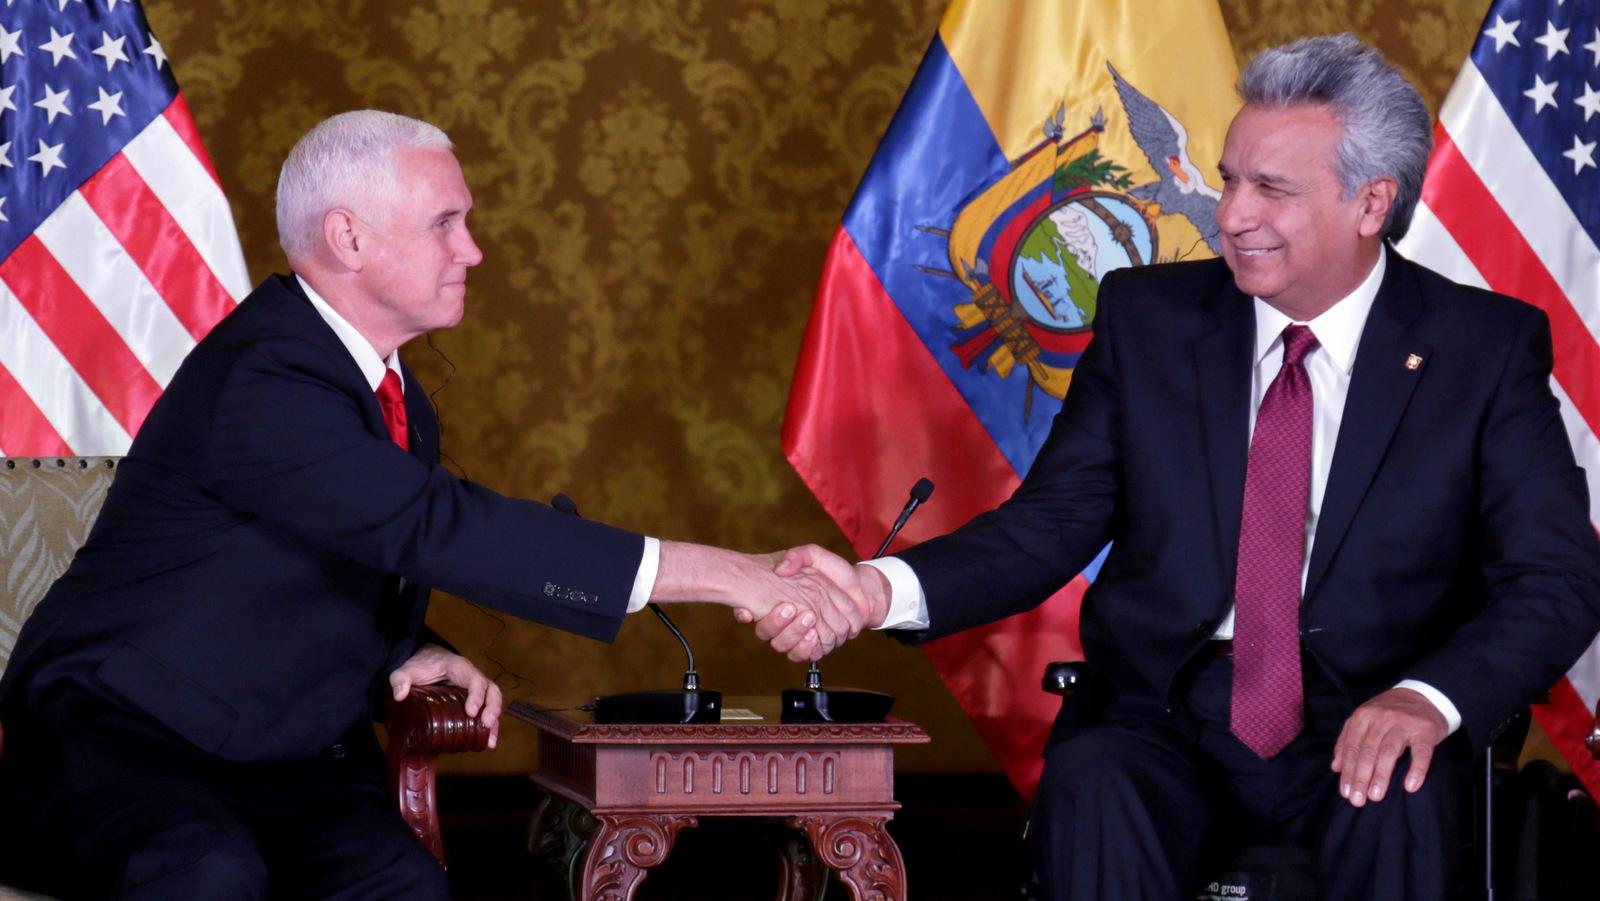 Ecuador Bows to US and IMF, Entering New Neoliberal Era